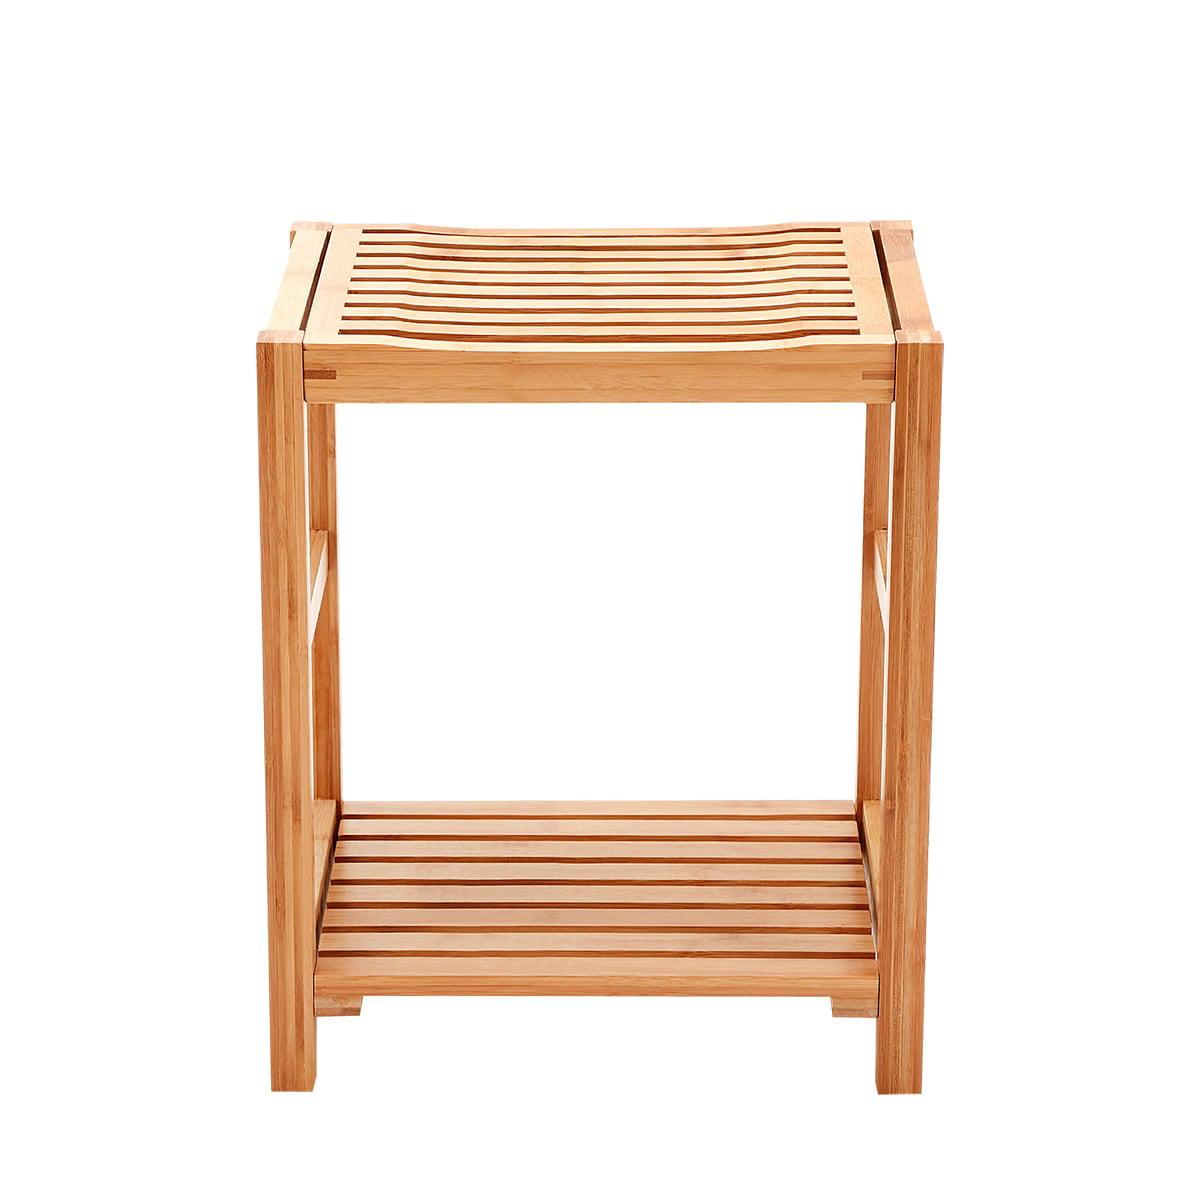 New Ridge Home Natural Bamboo Shower Bench Seat, Shaving Stool, Spa Bath Bench with Storage Shelf